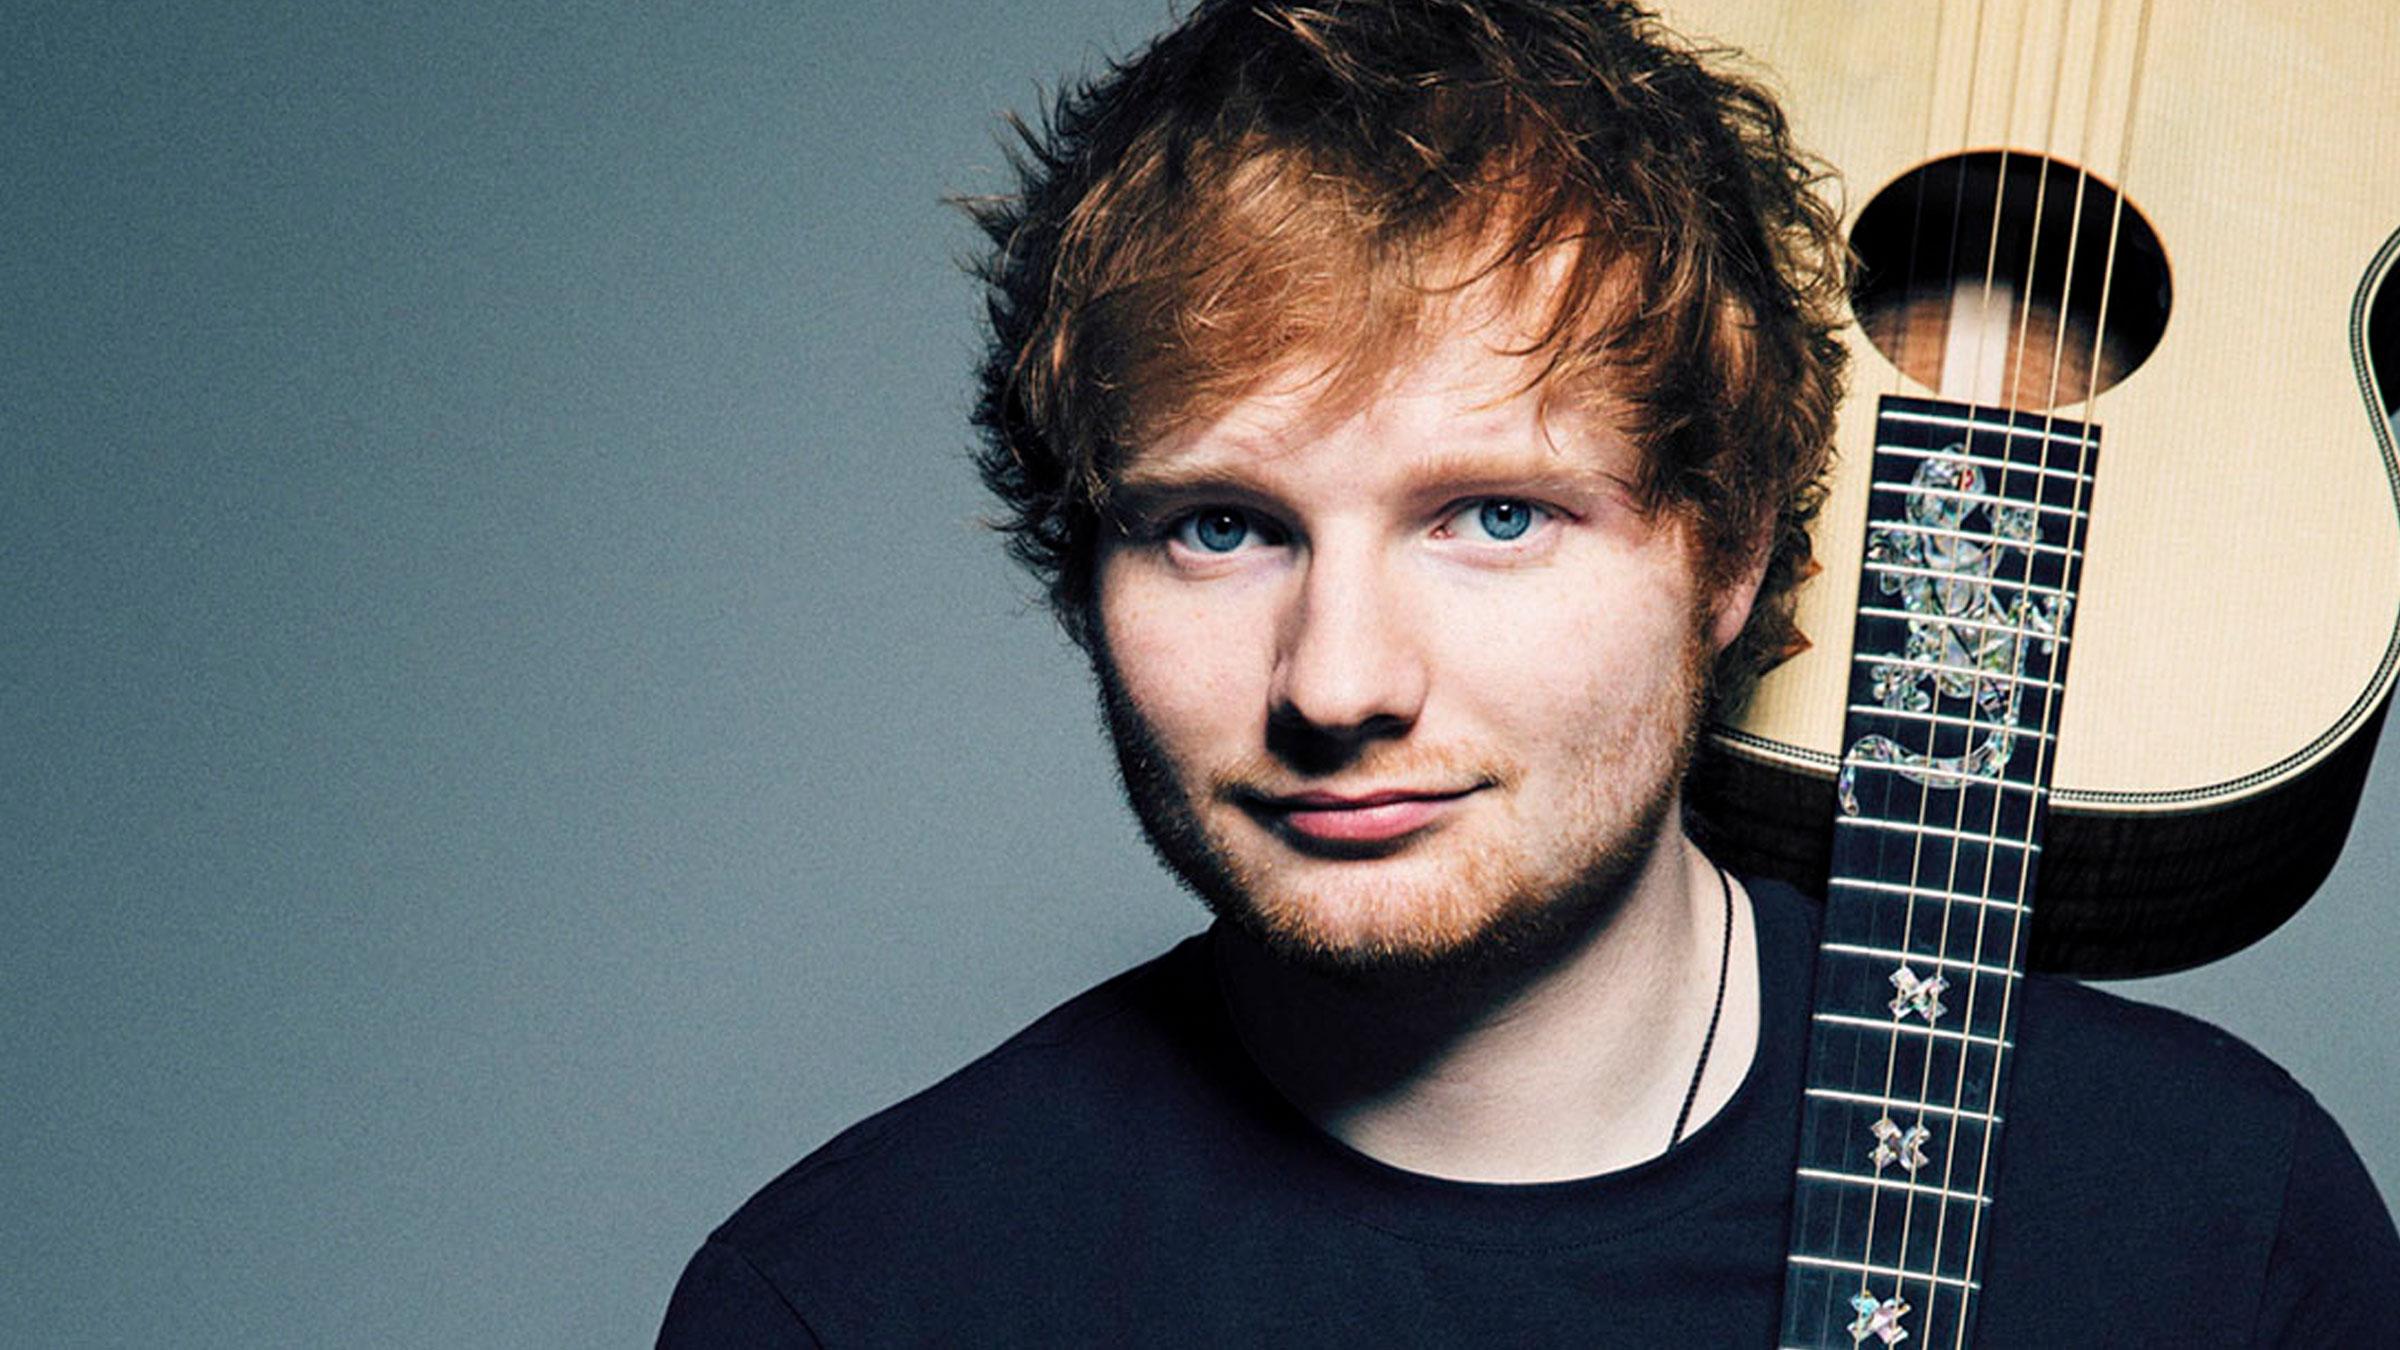 Ed spotify teaser